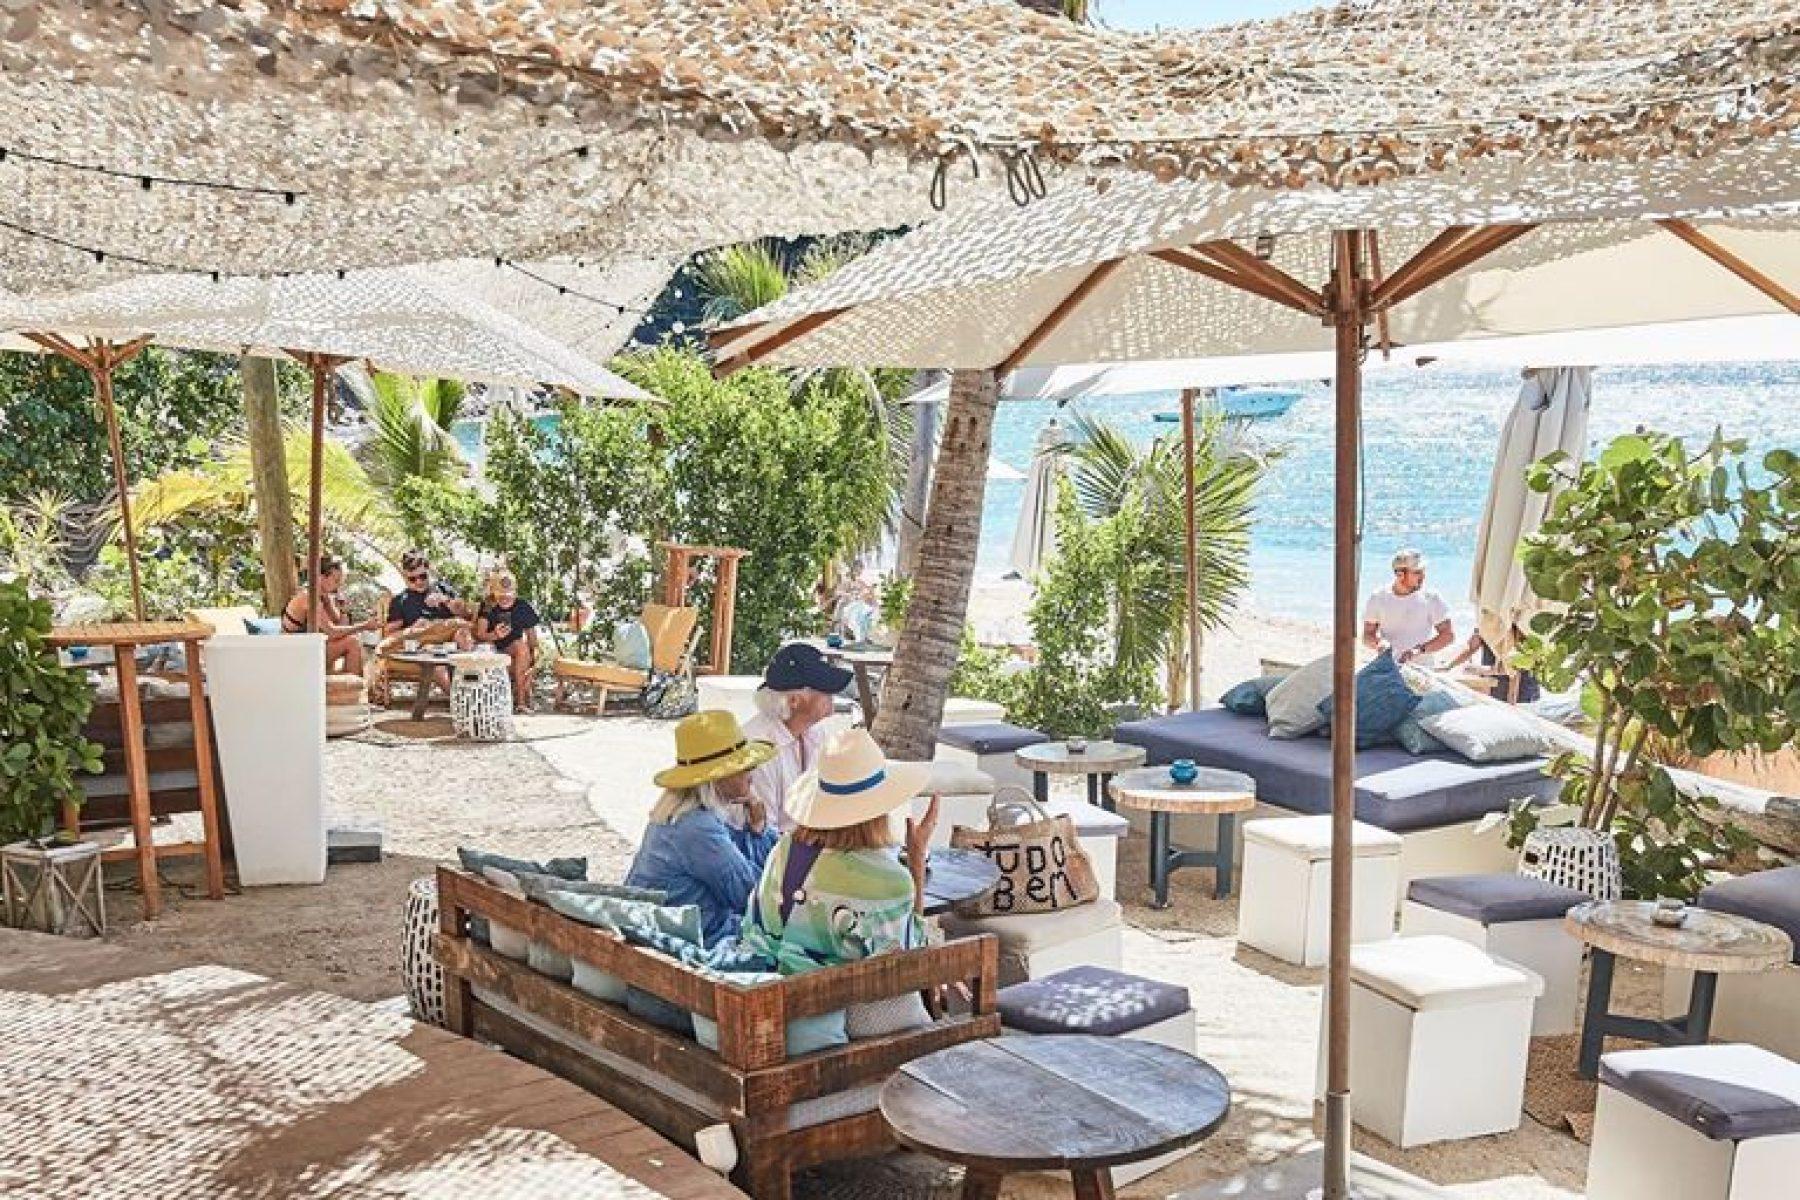 Shell On a Beach Club